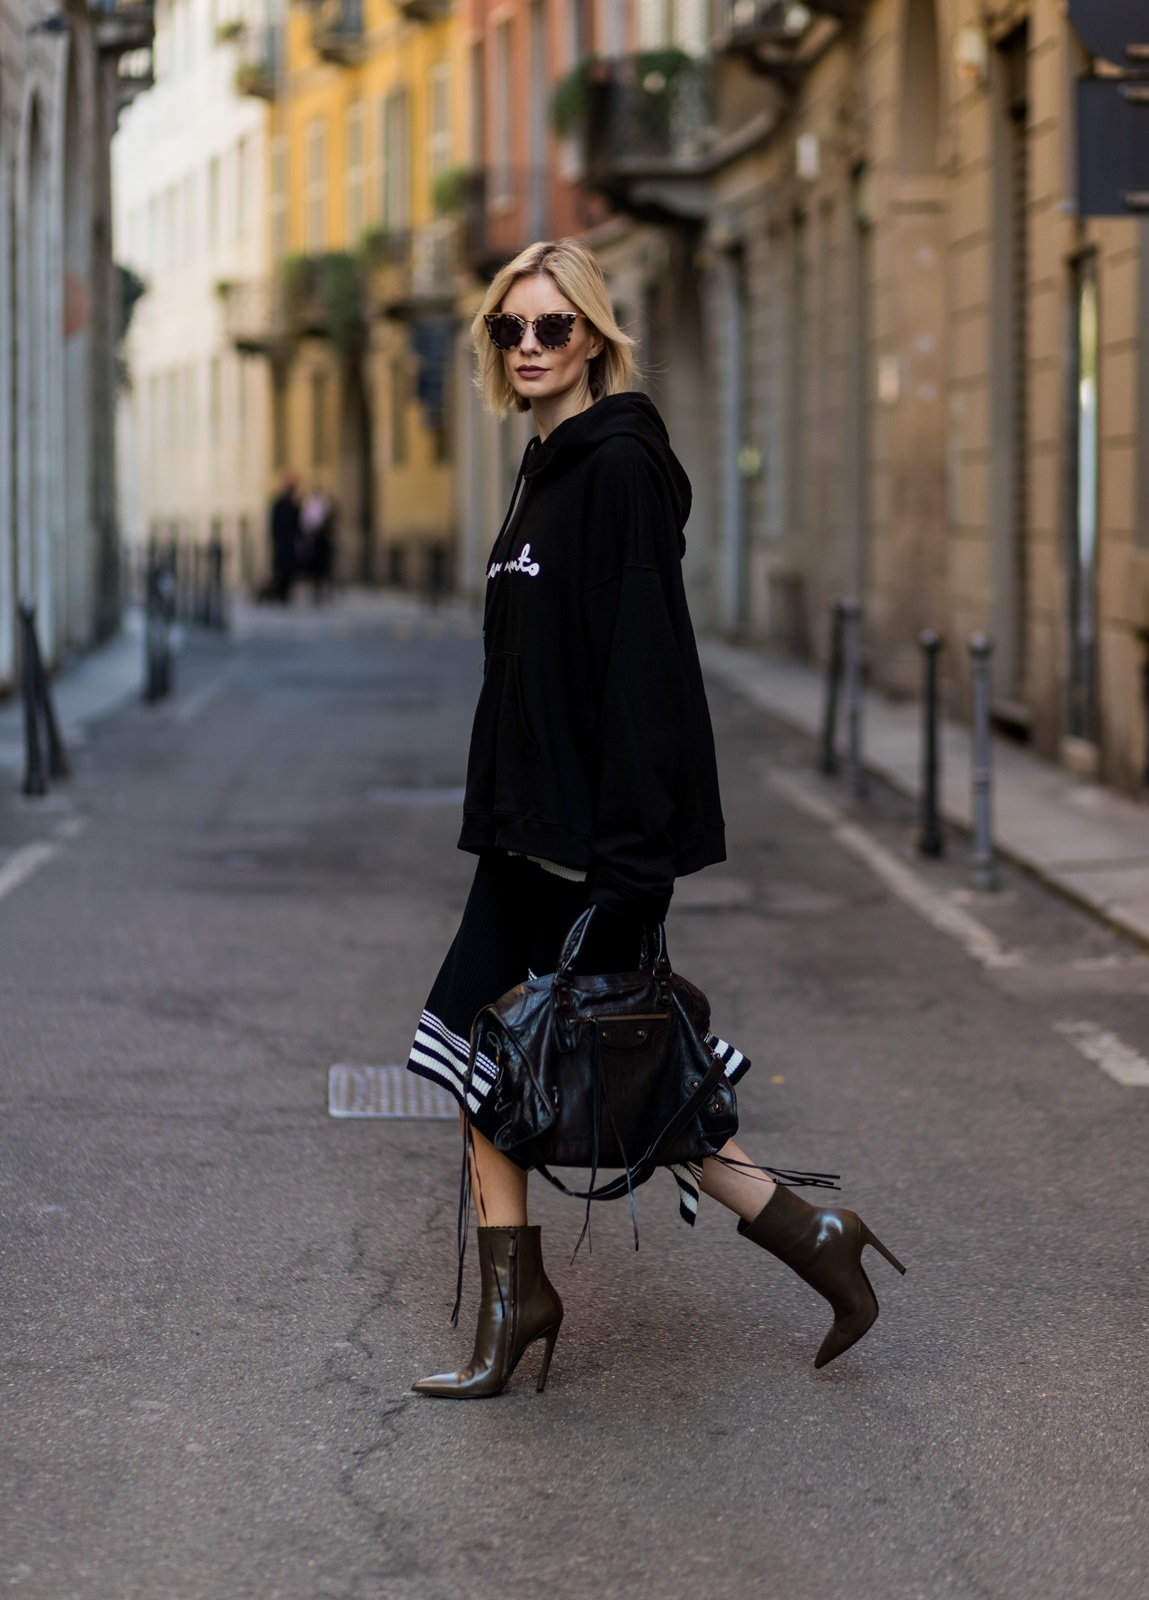 Balenciaga Bag Lisa Hahnbück Fashionblogger